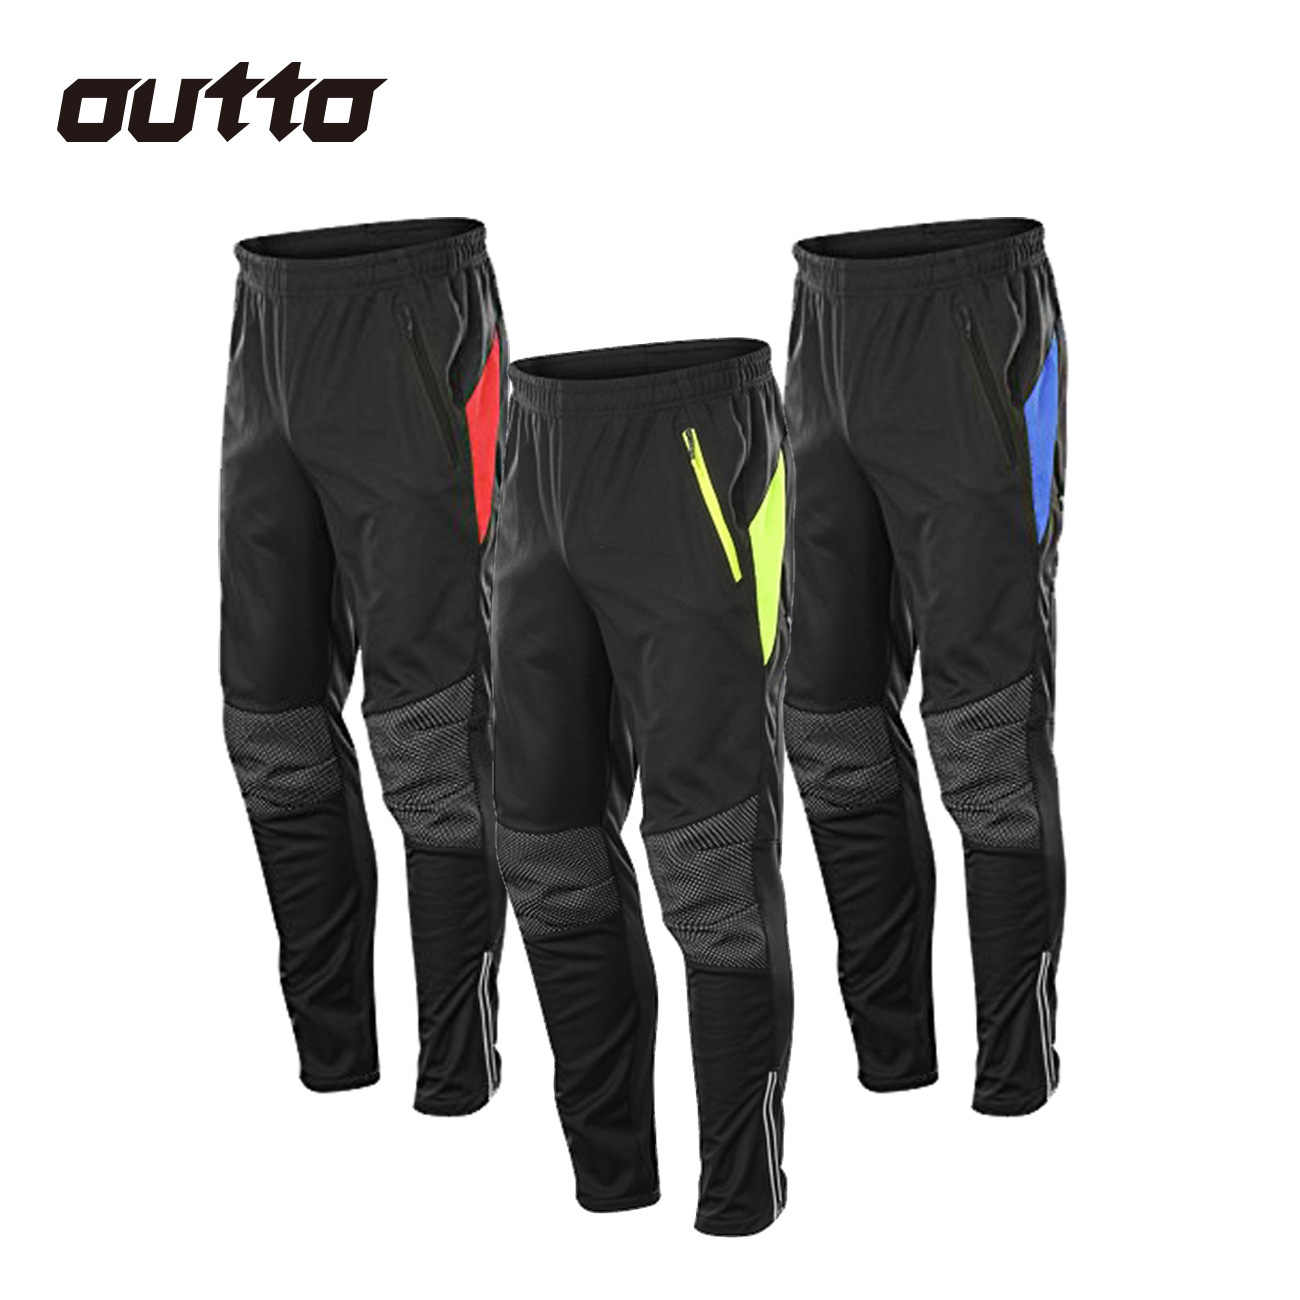 Pantalones Termicos De Lana Para Ciclismo Impermeables Para Invierno Transpirables Para Deportes Al Aire Libre Calidos Pantalones De Ciclismo Aliexpress